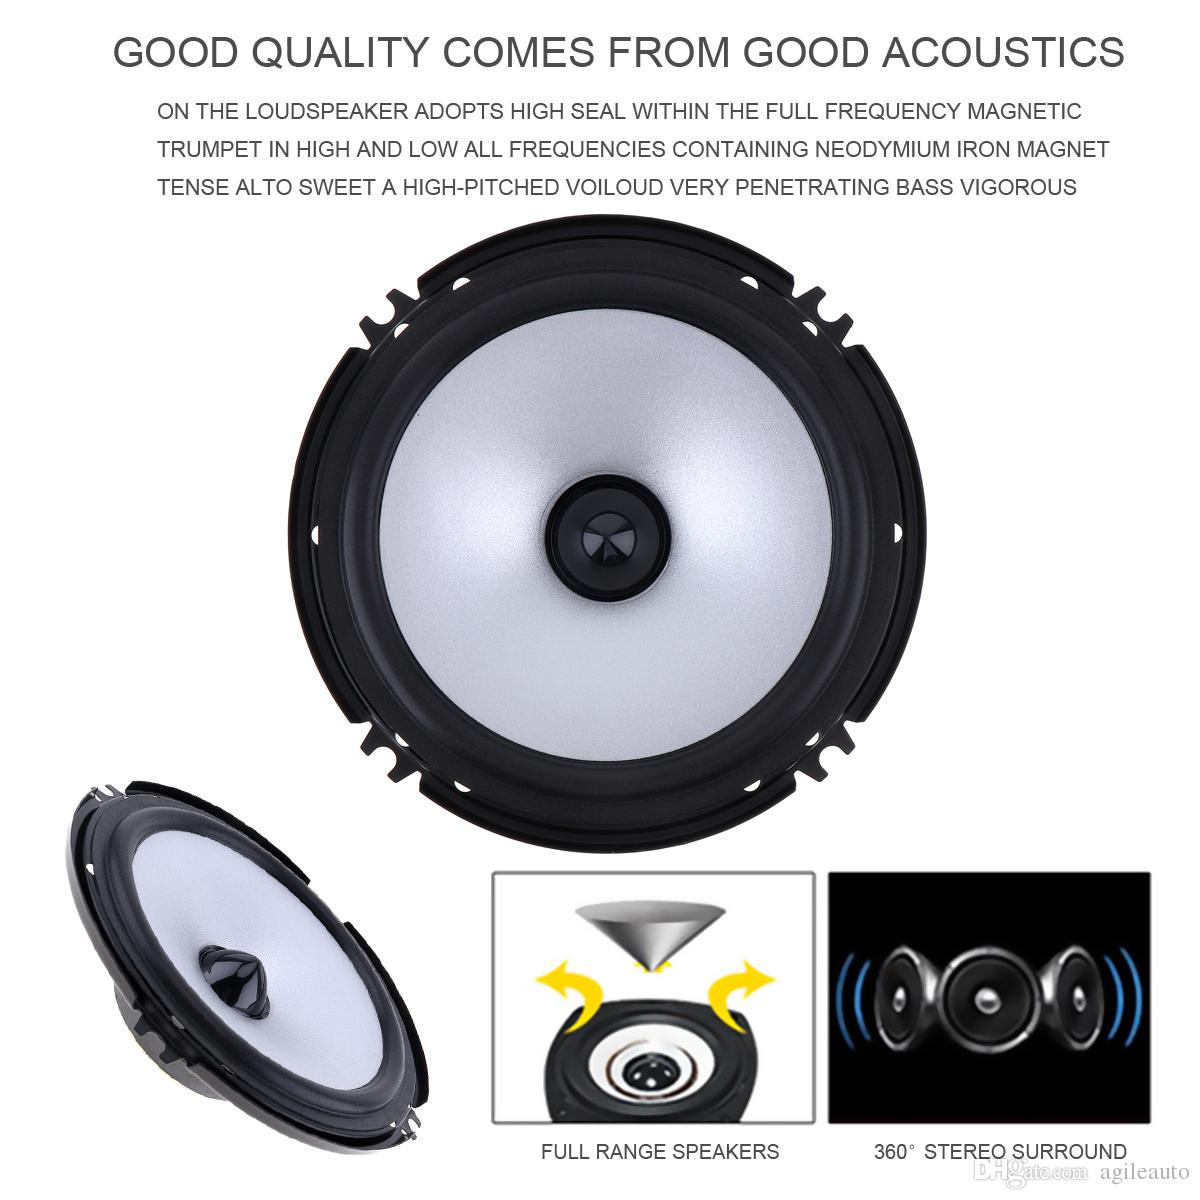 hight resolution of 6 5 inch 60w car speaker automobile car hifi audio full range frequency speaker cau 404 best price car audio best price car stereo from agileauto